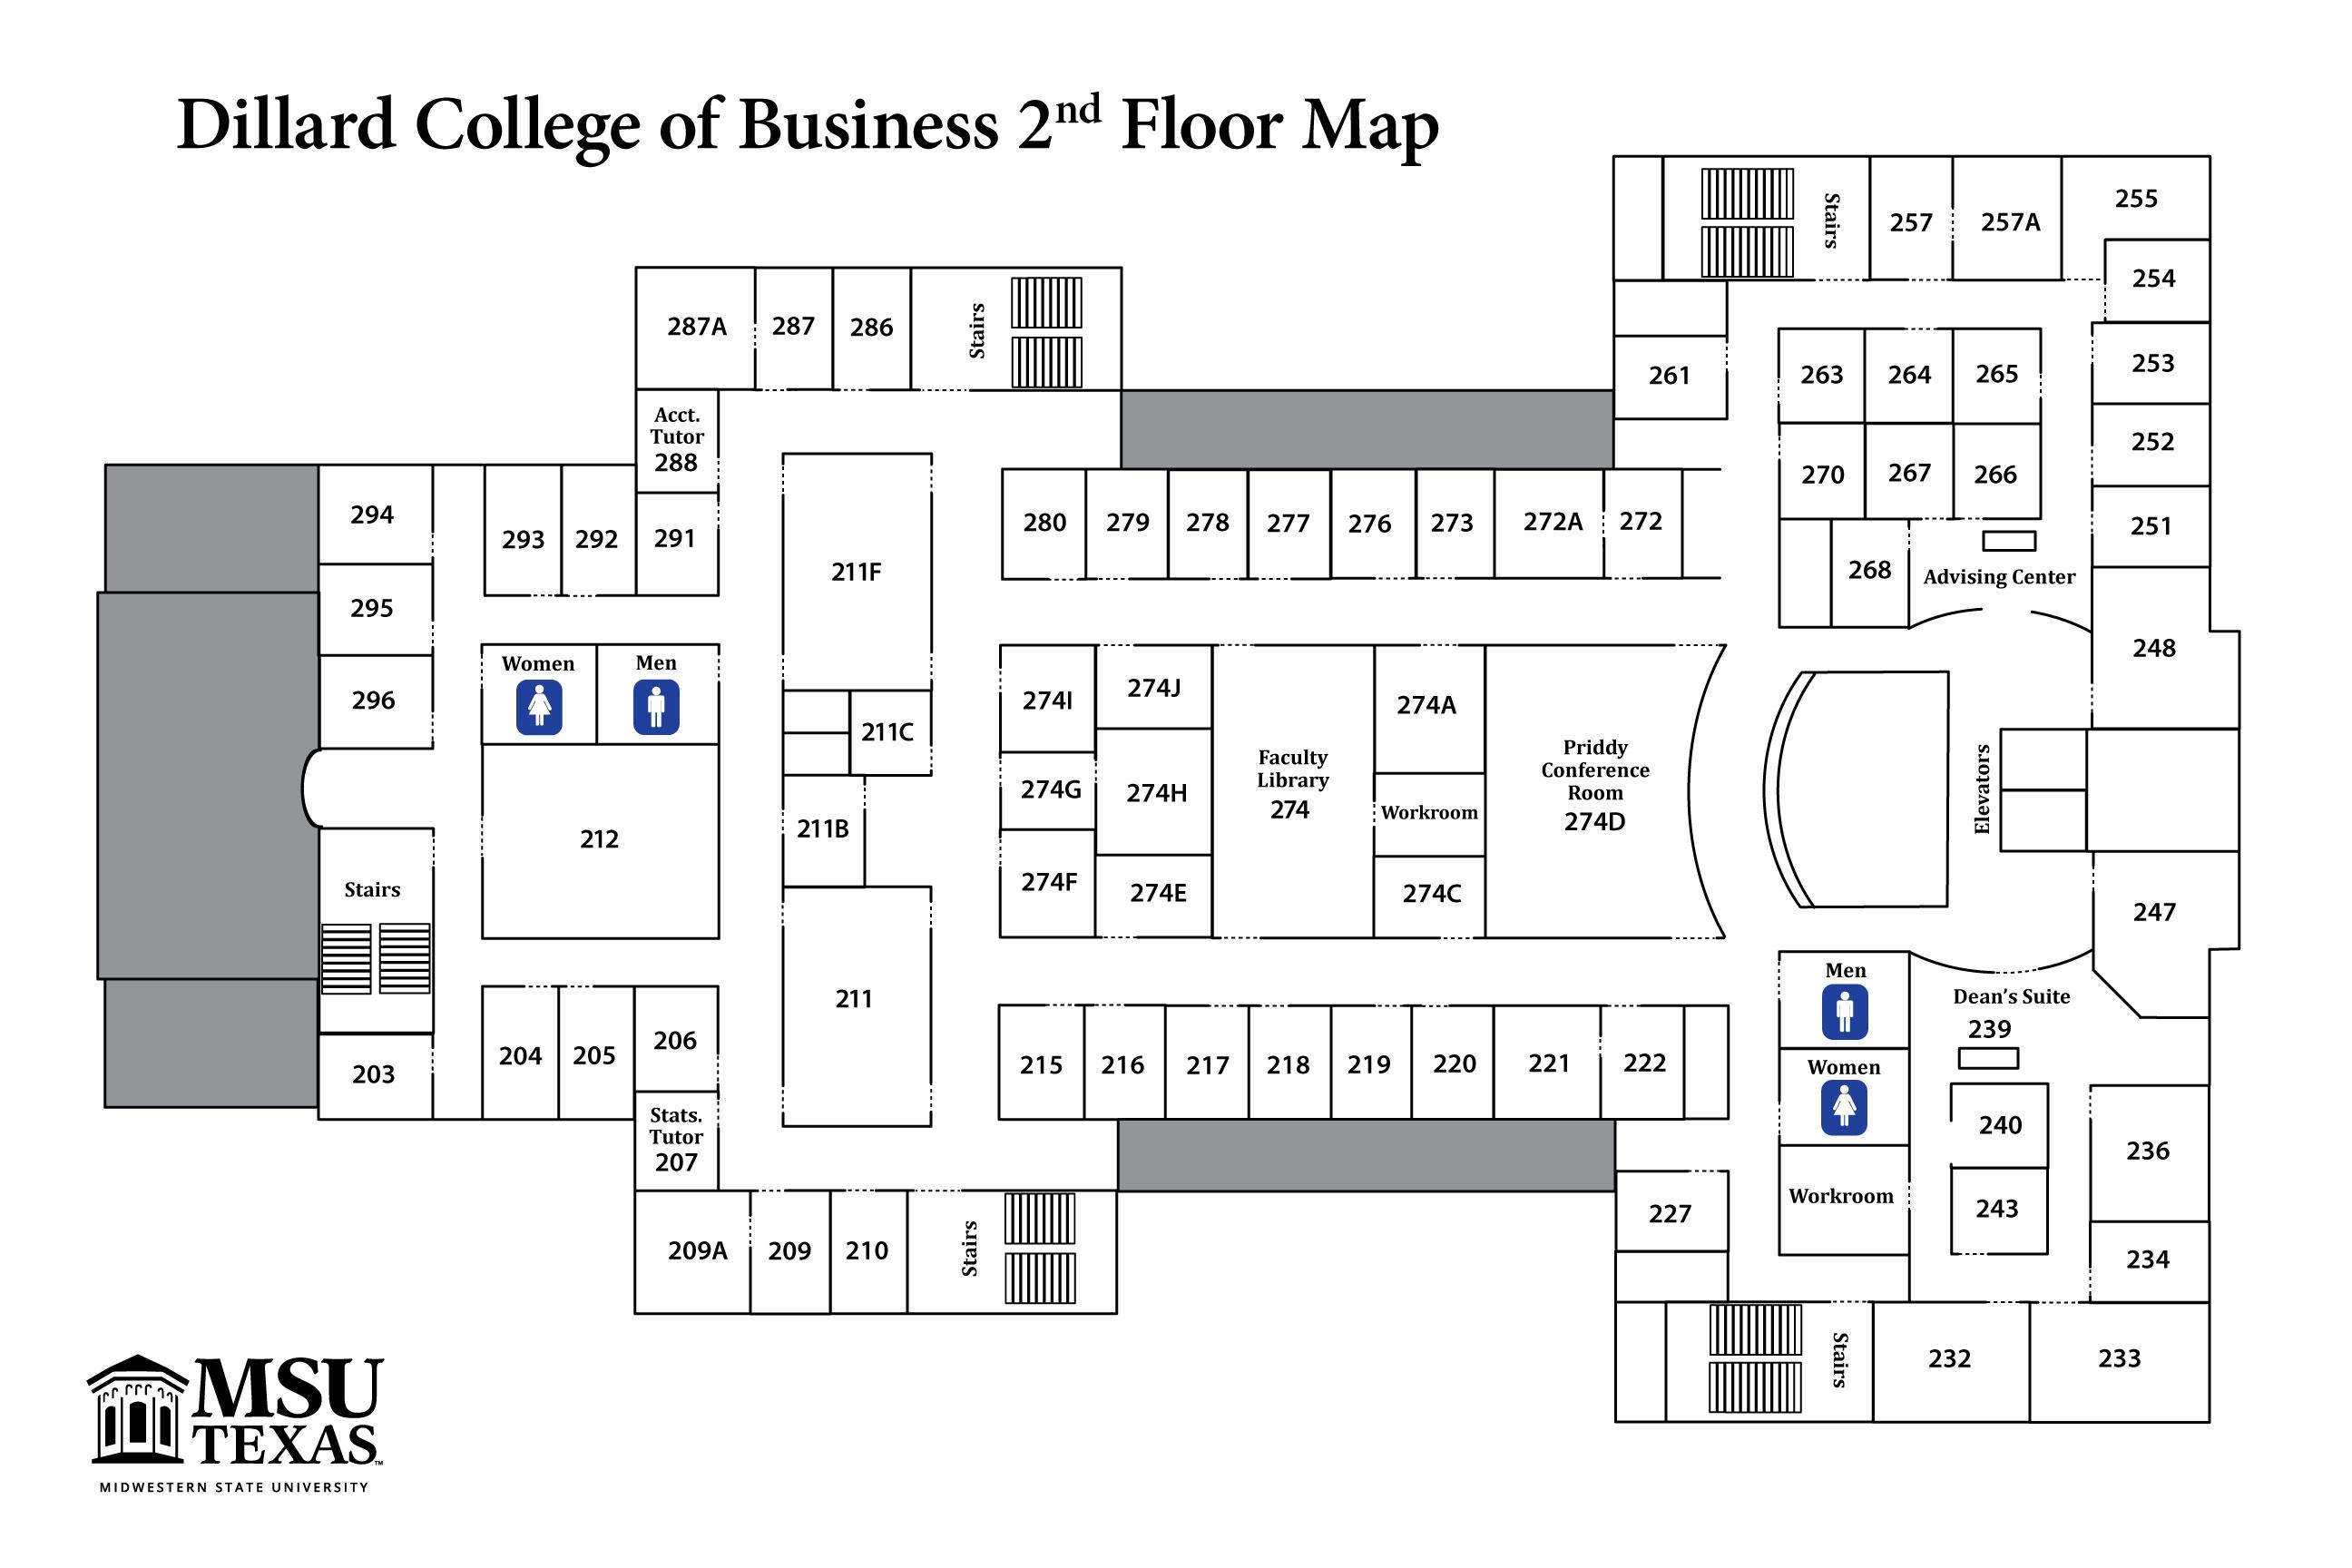 Dillard College Maps College Information Business Academics Msu Texas